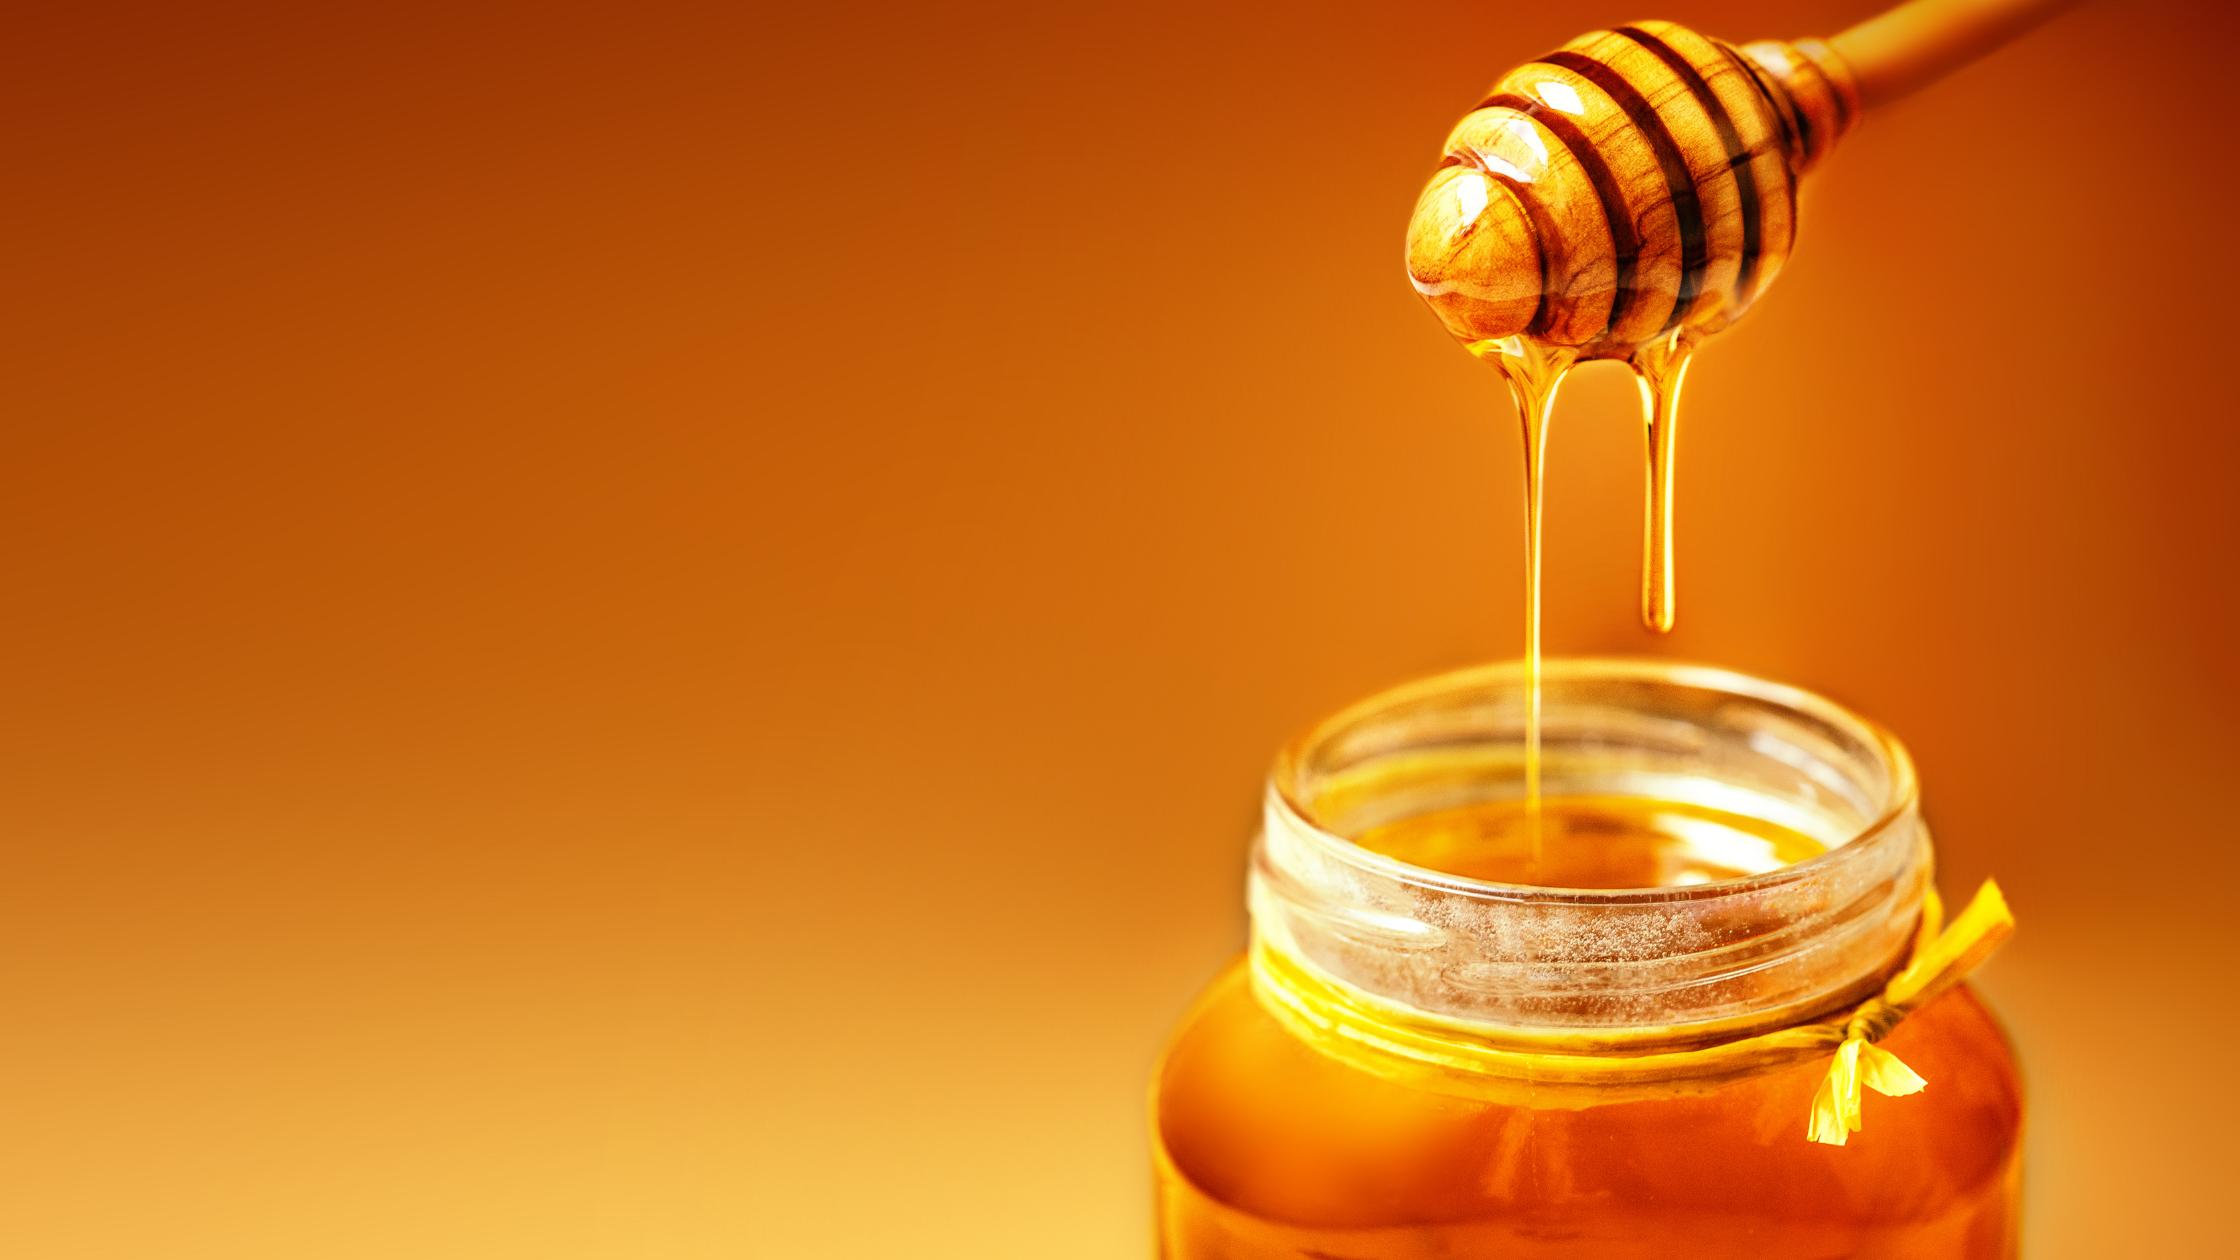 Honey during winter